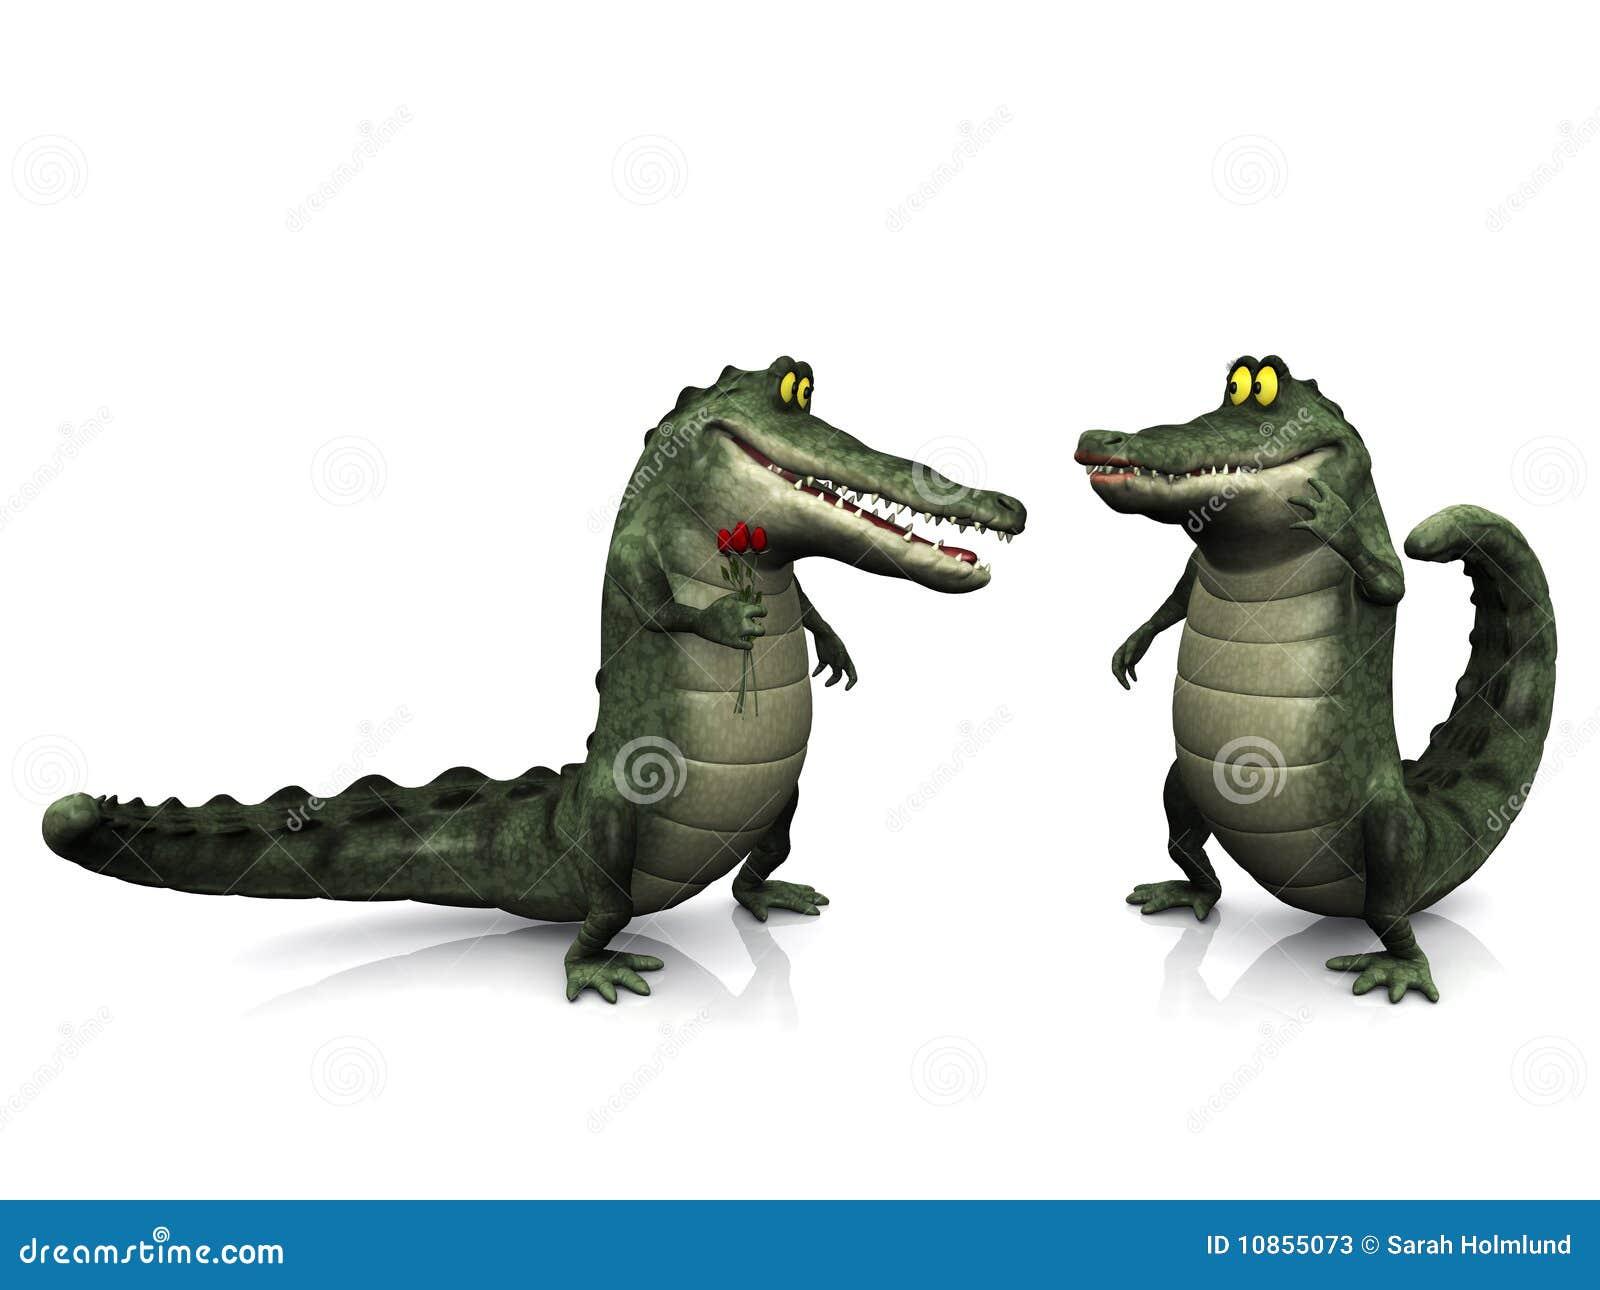 cartoon crocodile couple  stock illustration  illustration of smiling